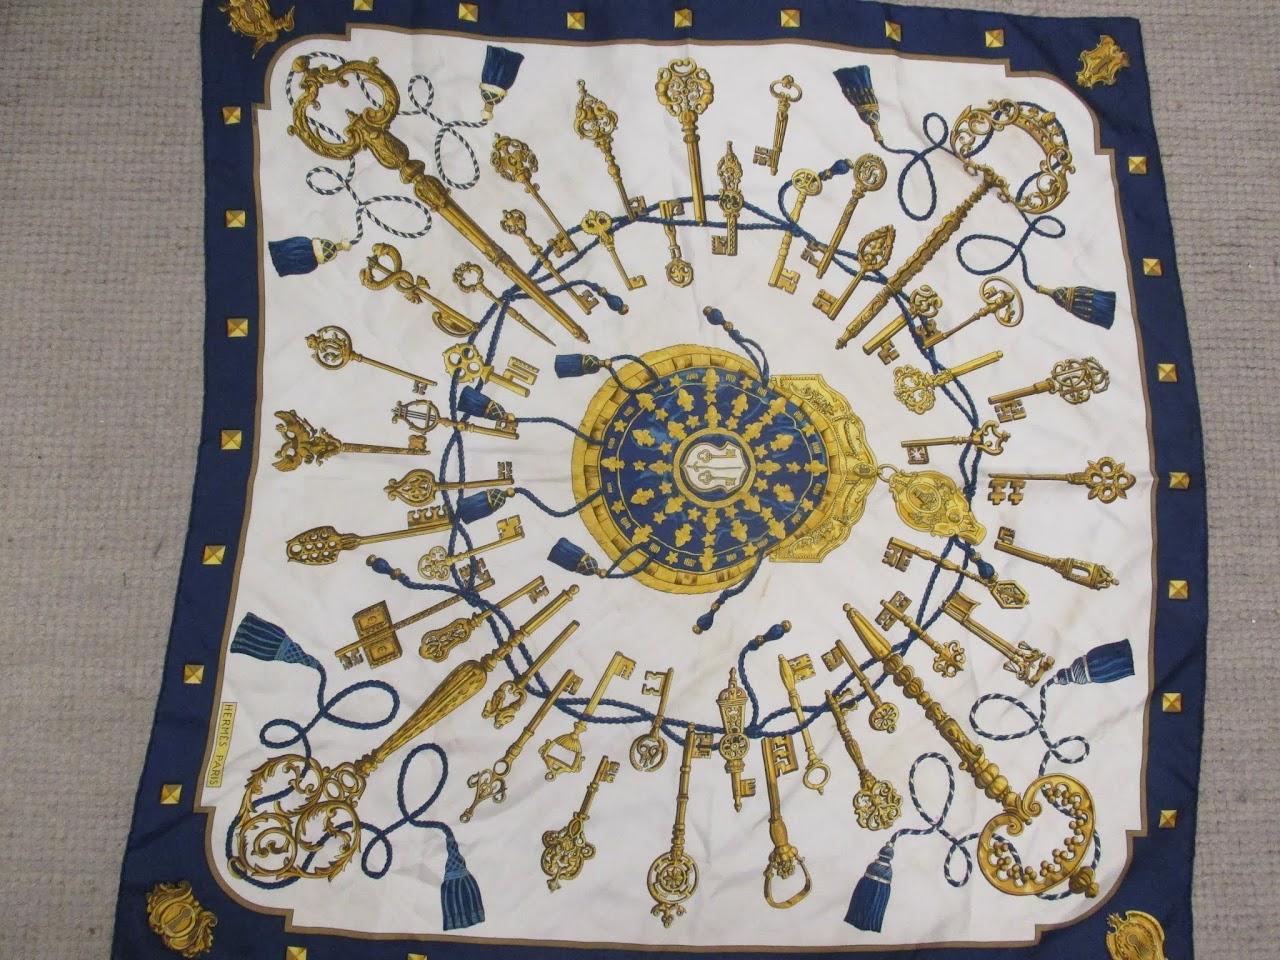 Hermes Key and Tassel Scarf